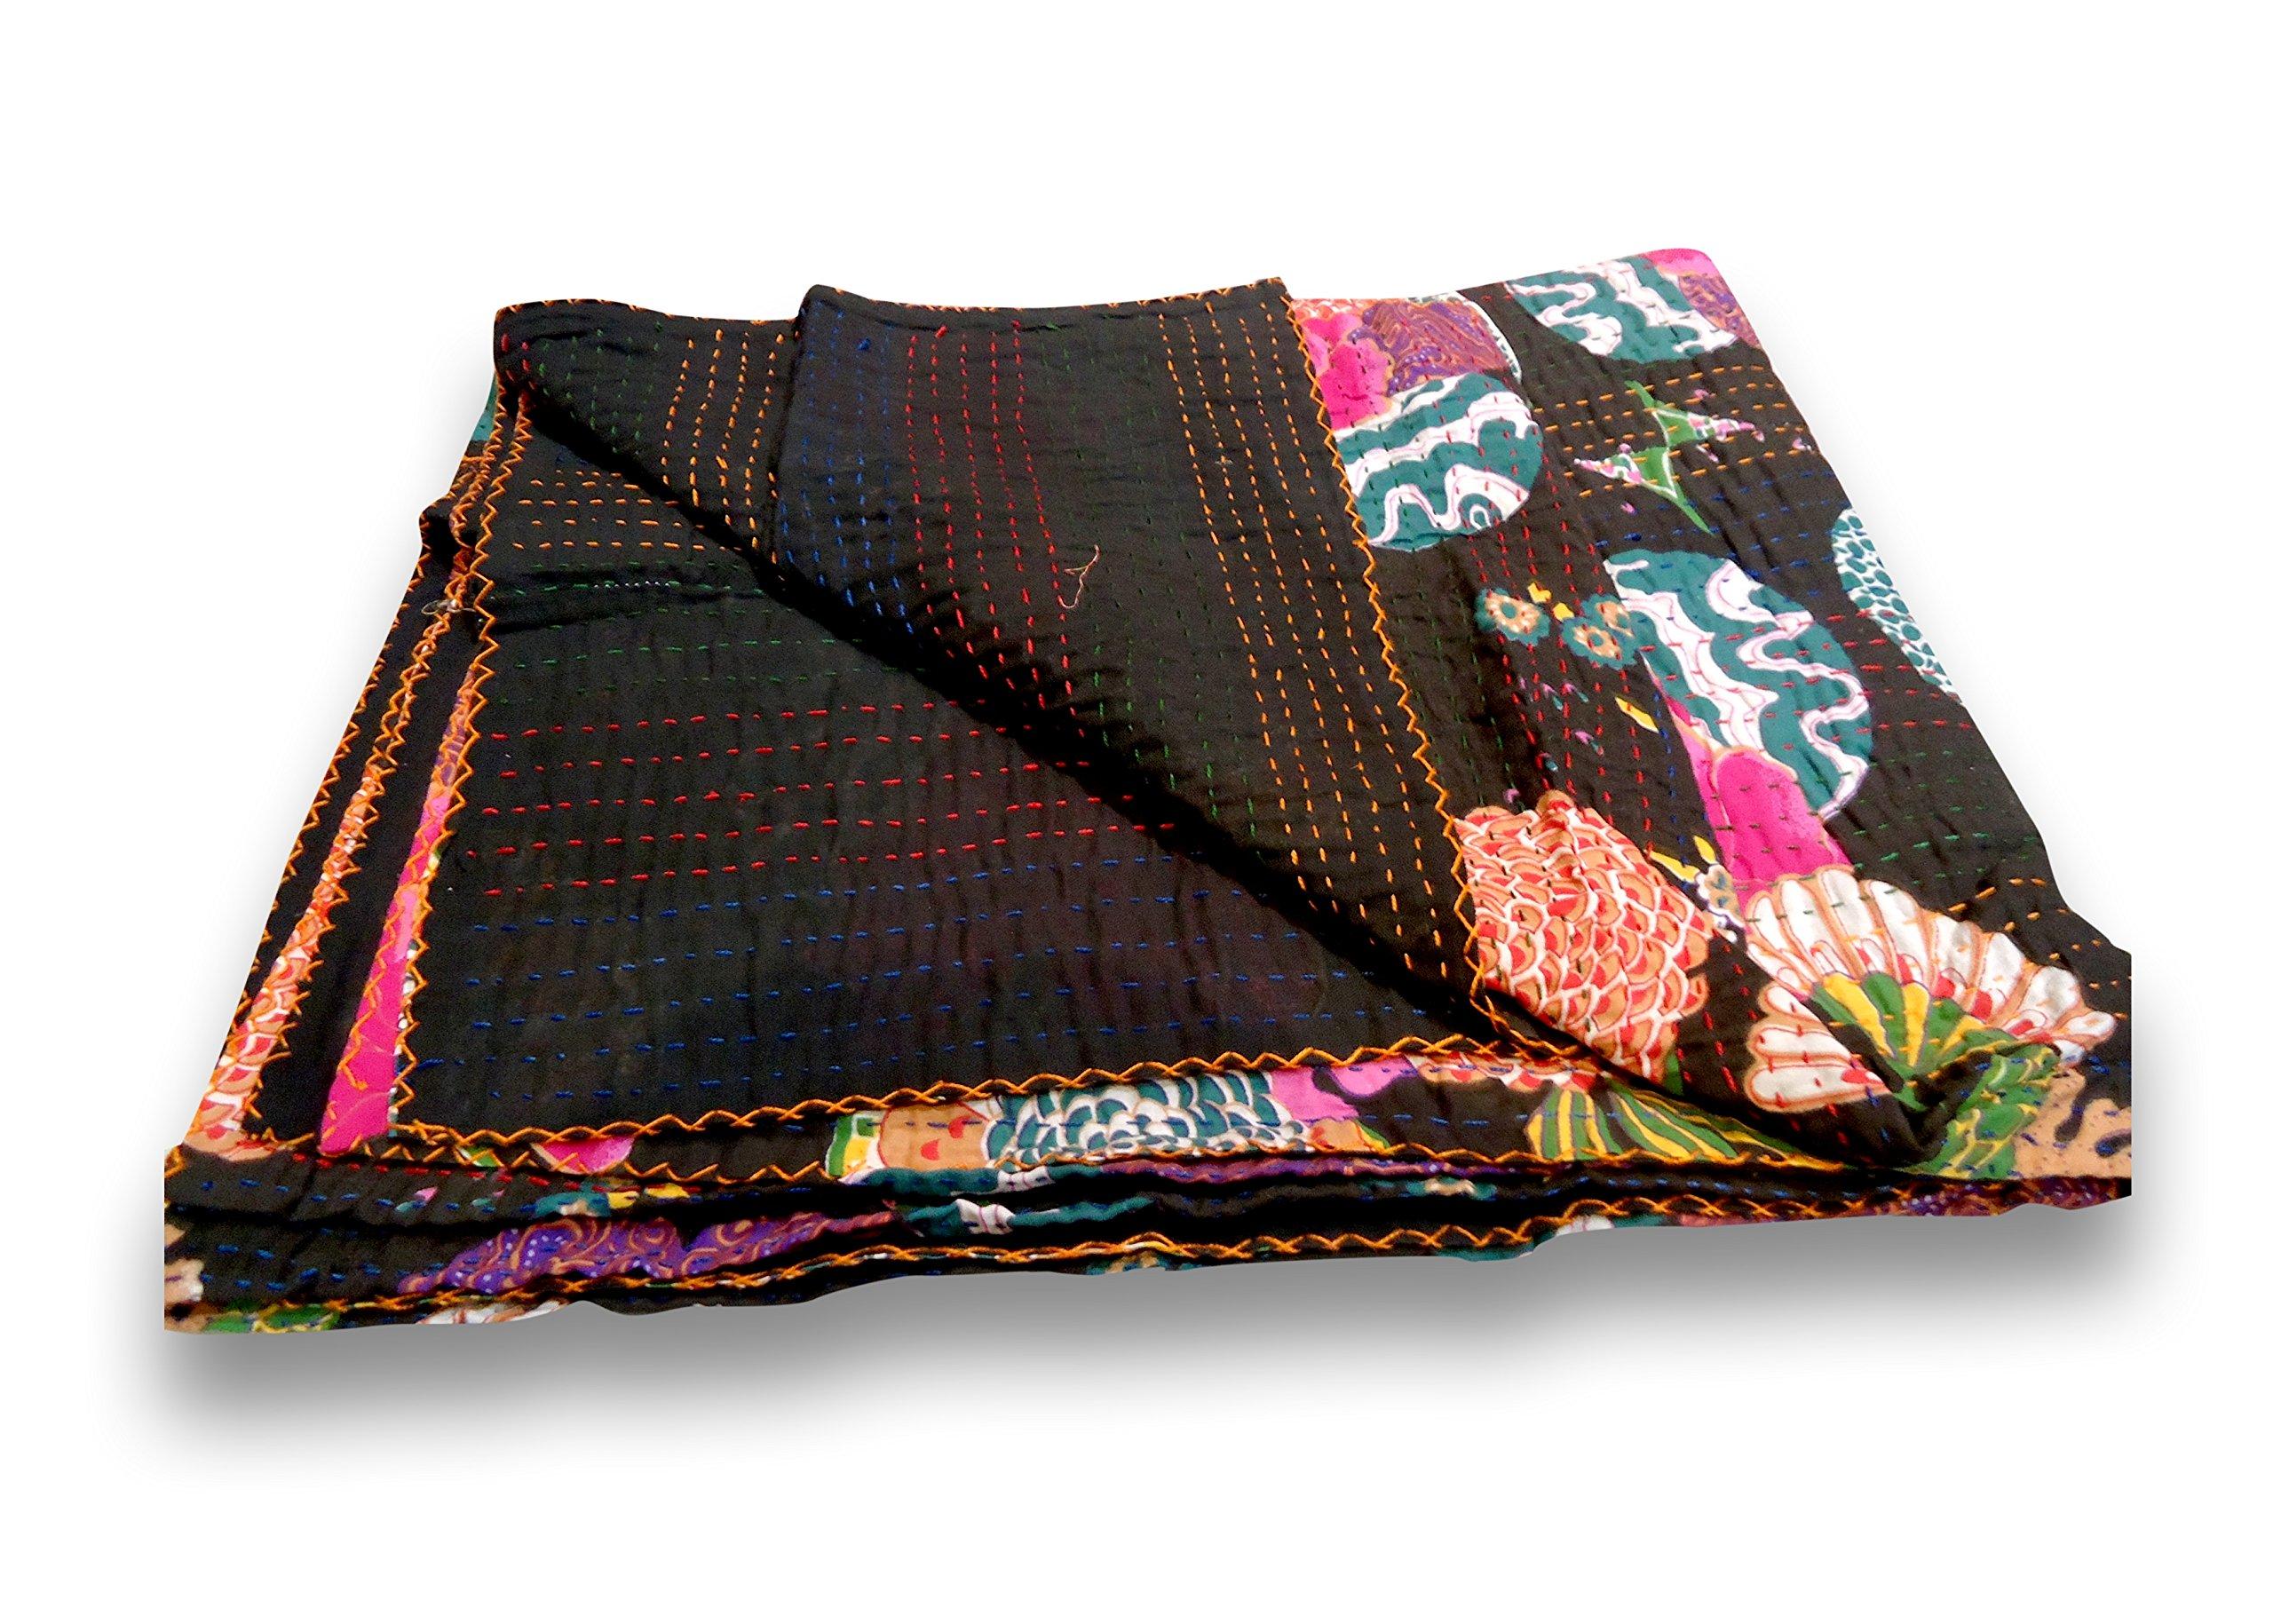 Sophia Art Indian Fruit Reversible Bedspread Pattern Blue Gudri Pure Cotton Kantha Style Queen Size Quilt Bed Spread Floral & Fruit Print Decorative Kantha Stitch Quilt 90X108 NCH. (Black)